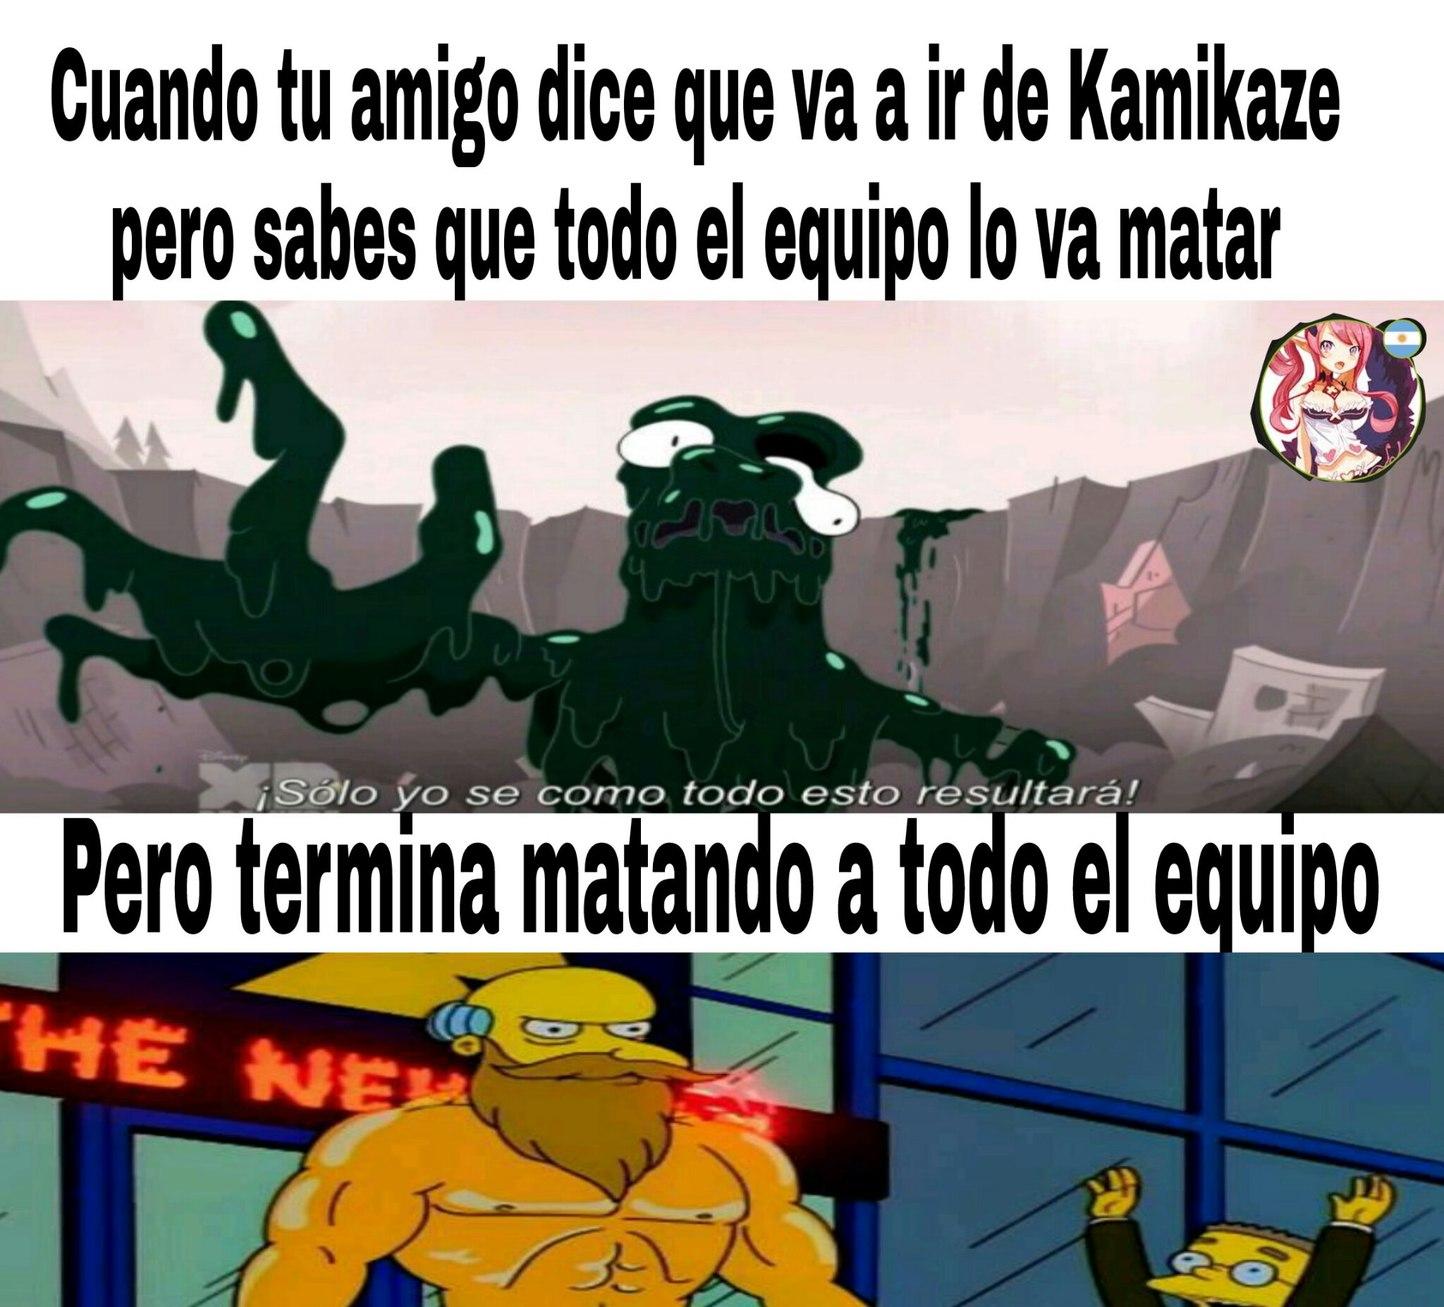 Mi 6to meme :D